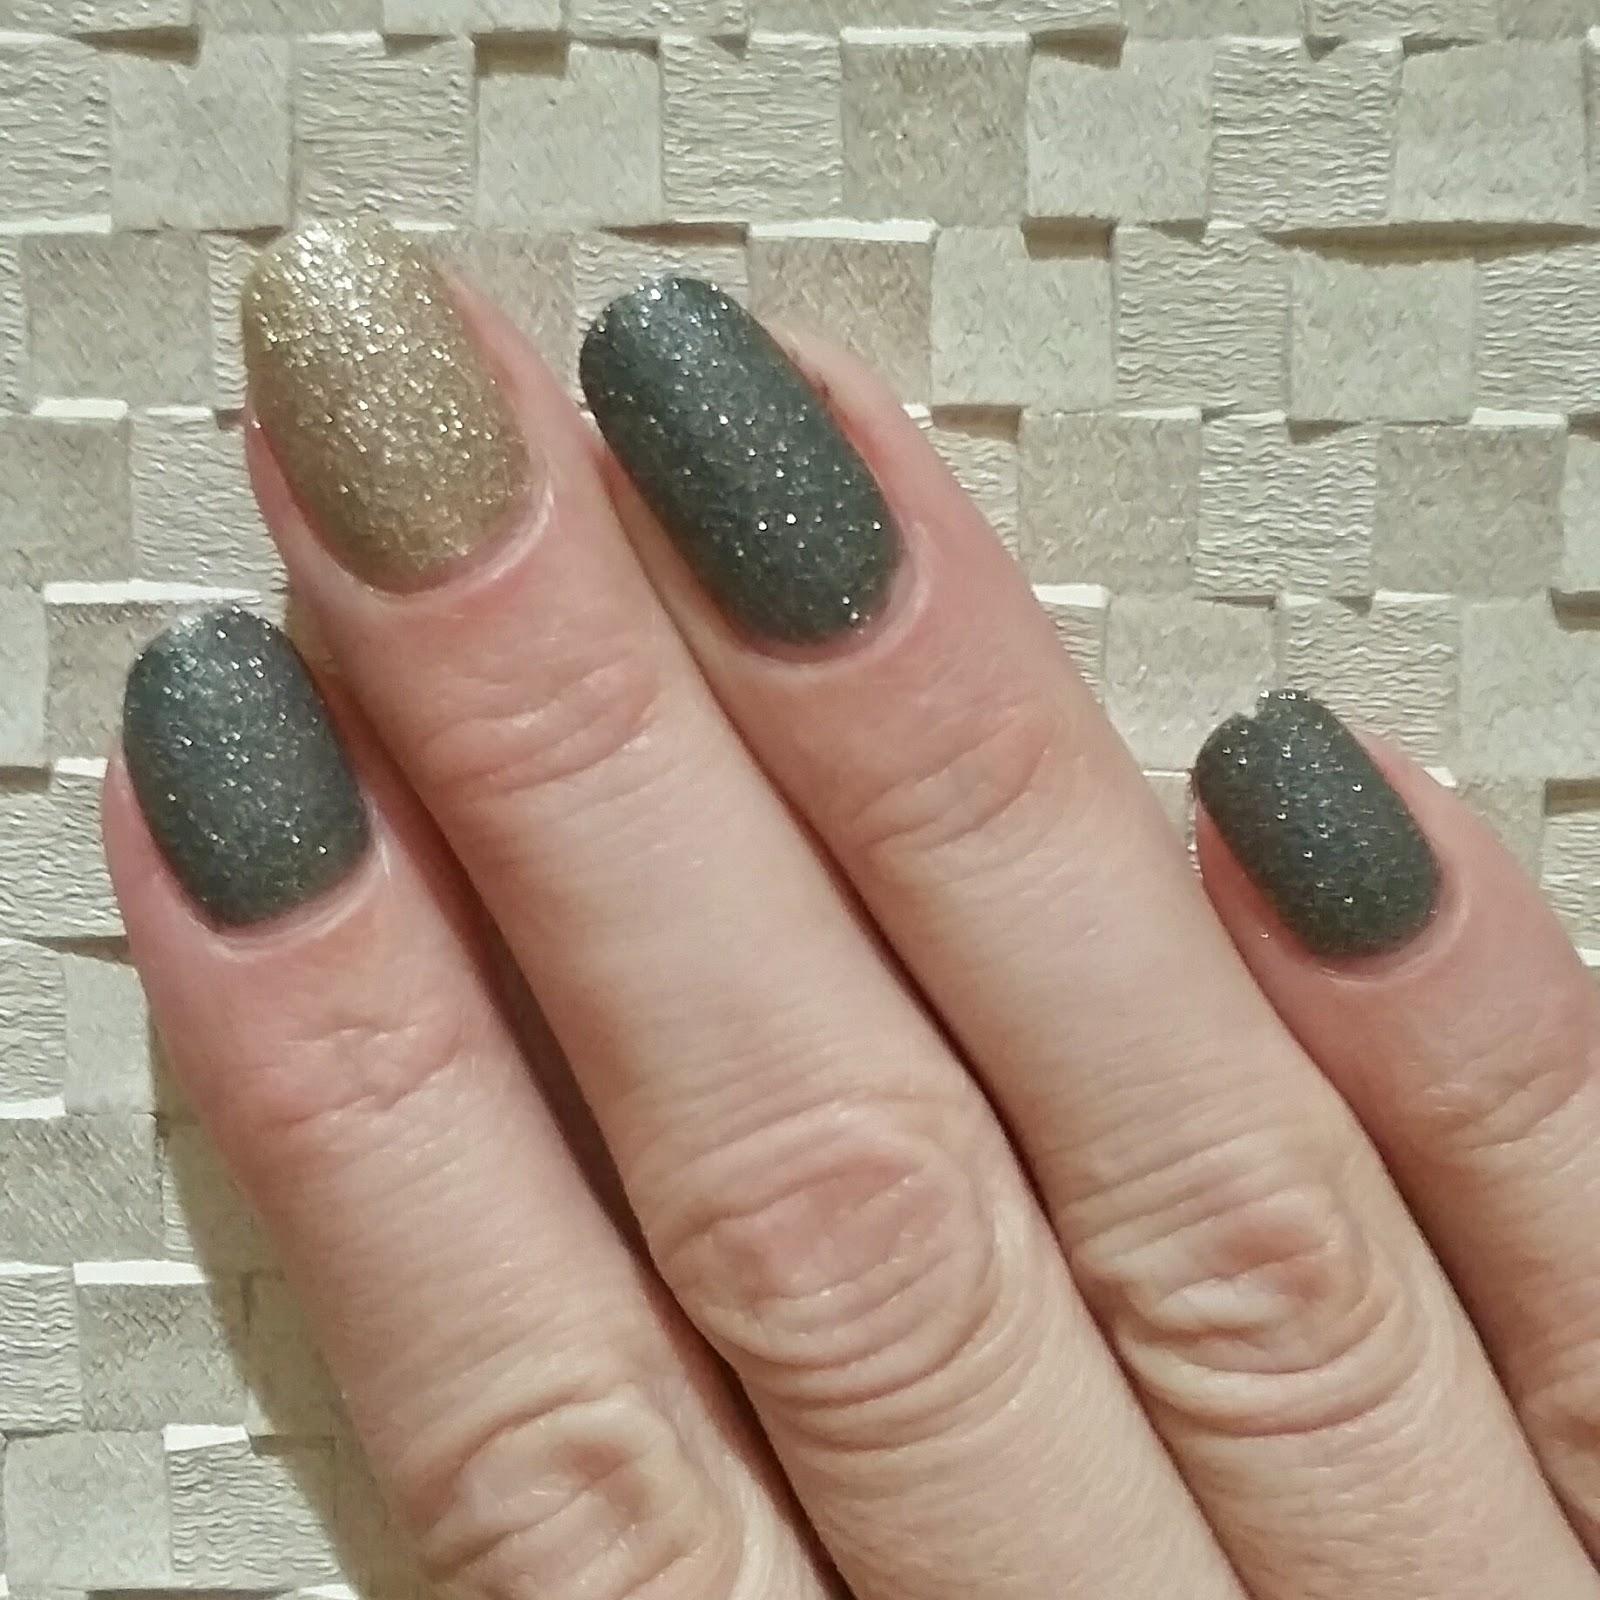 Concrete and Nail Polish: New York City Trip With Zoya!